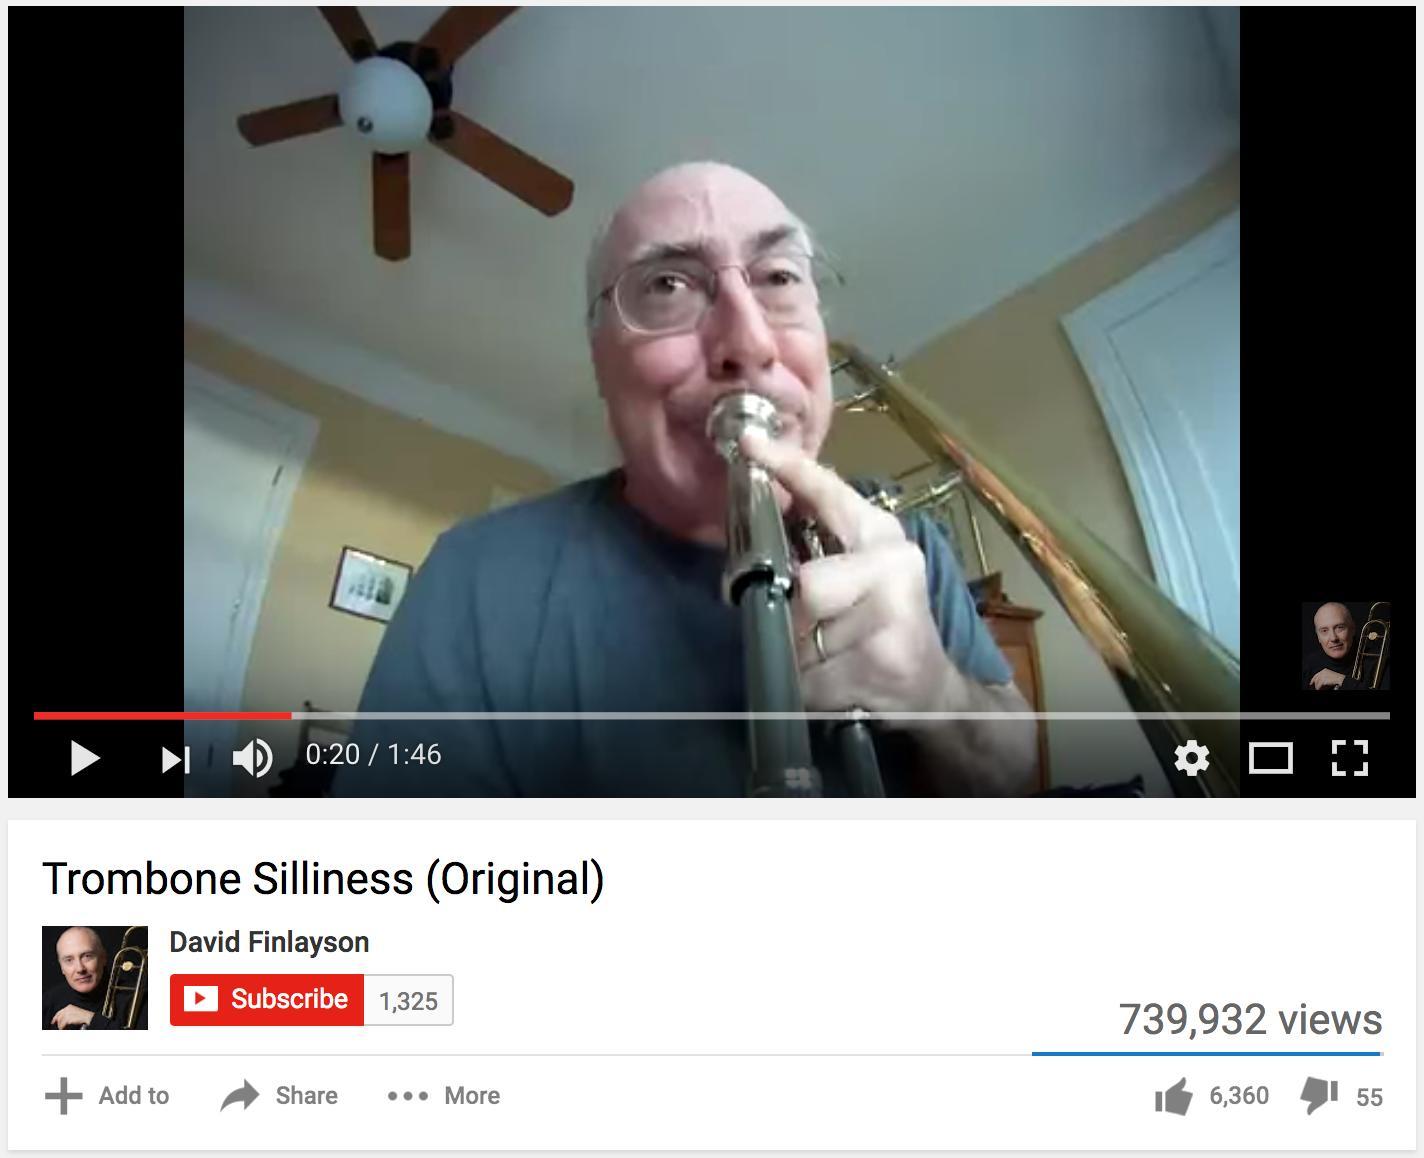 Trombone silliness